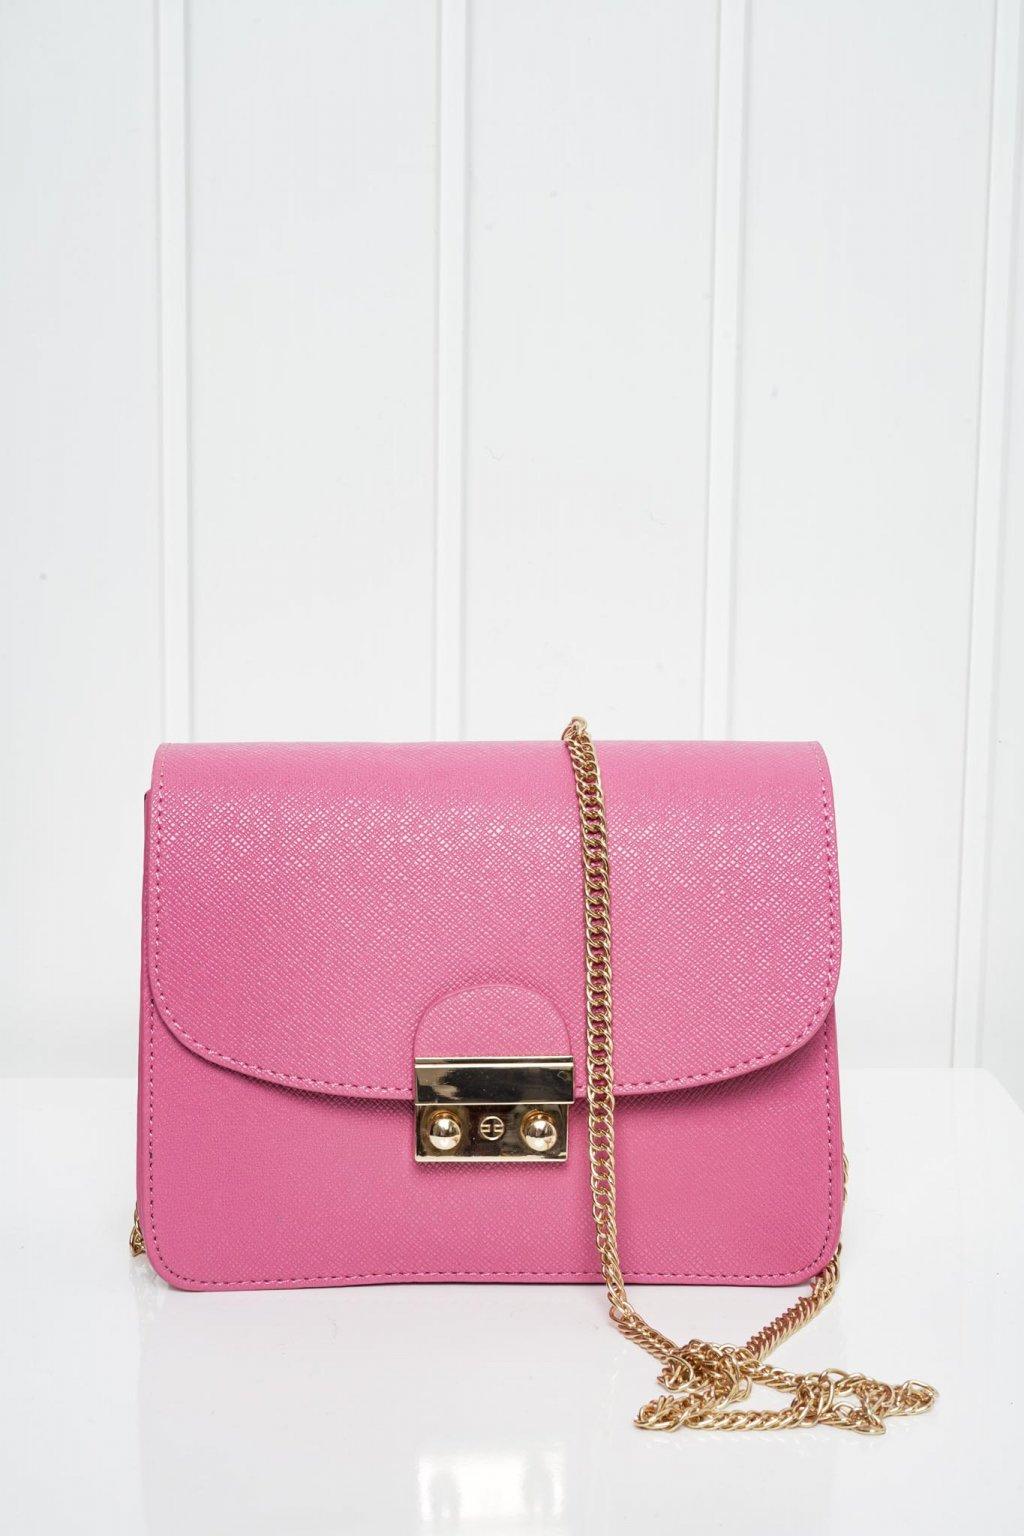 Kabelka, crossbody, ruksak, shopping bag, shopperka, 493